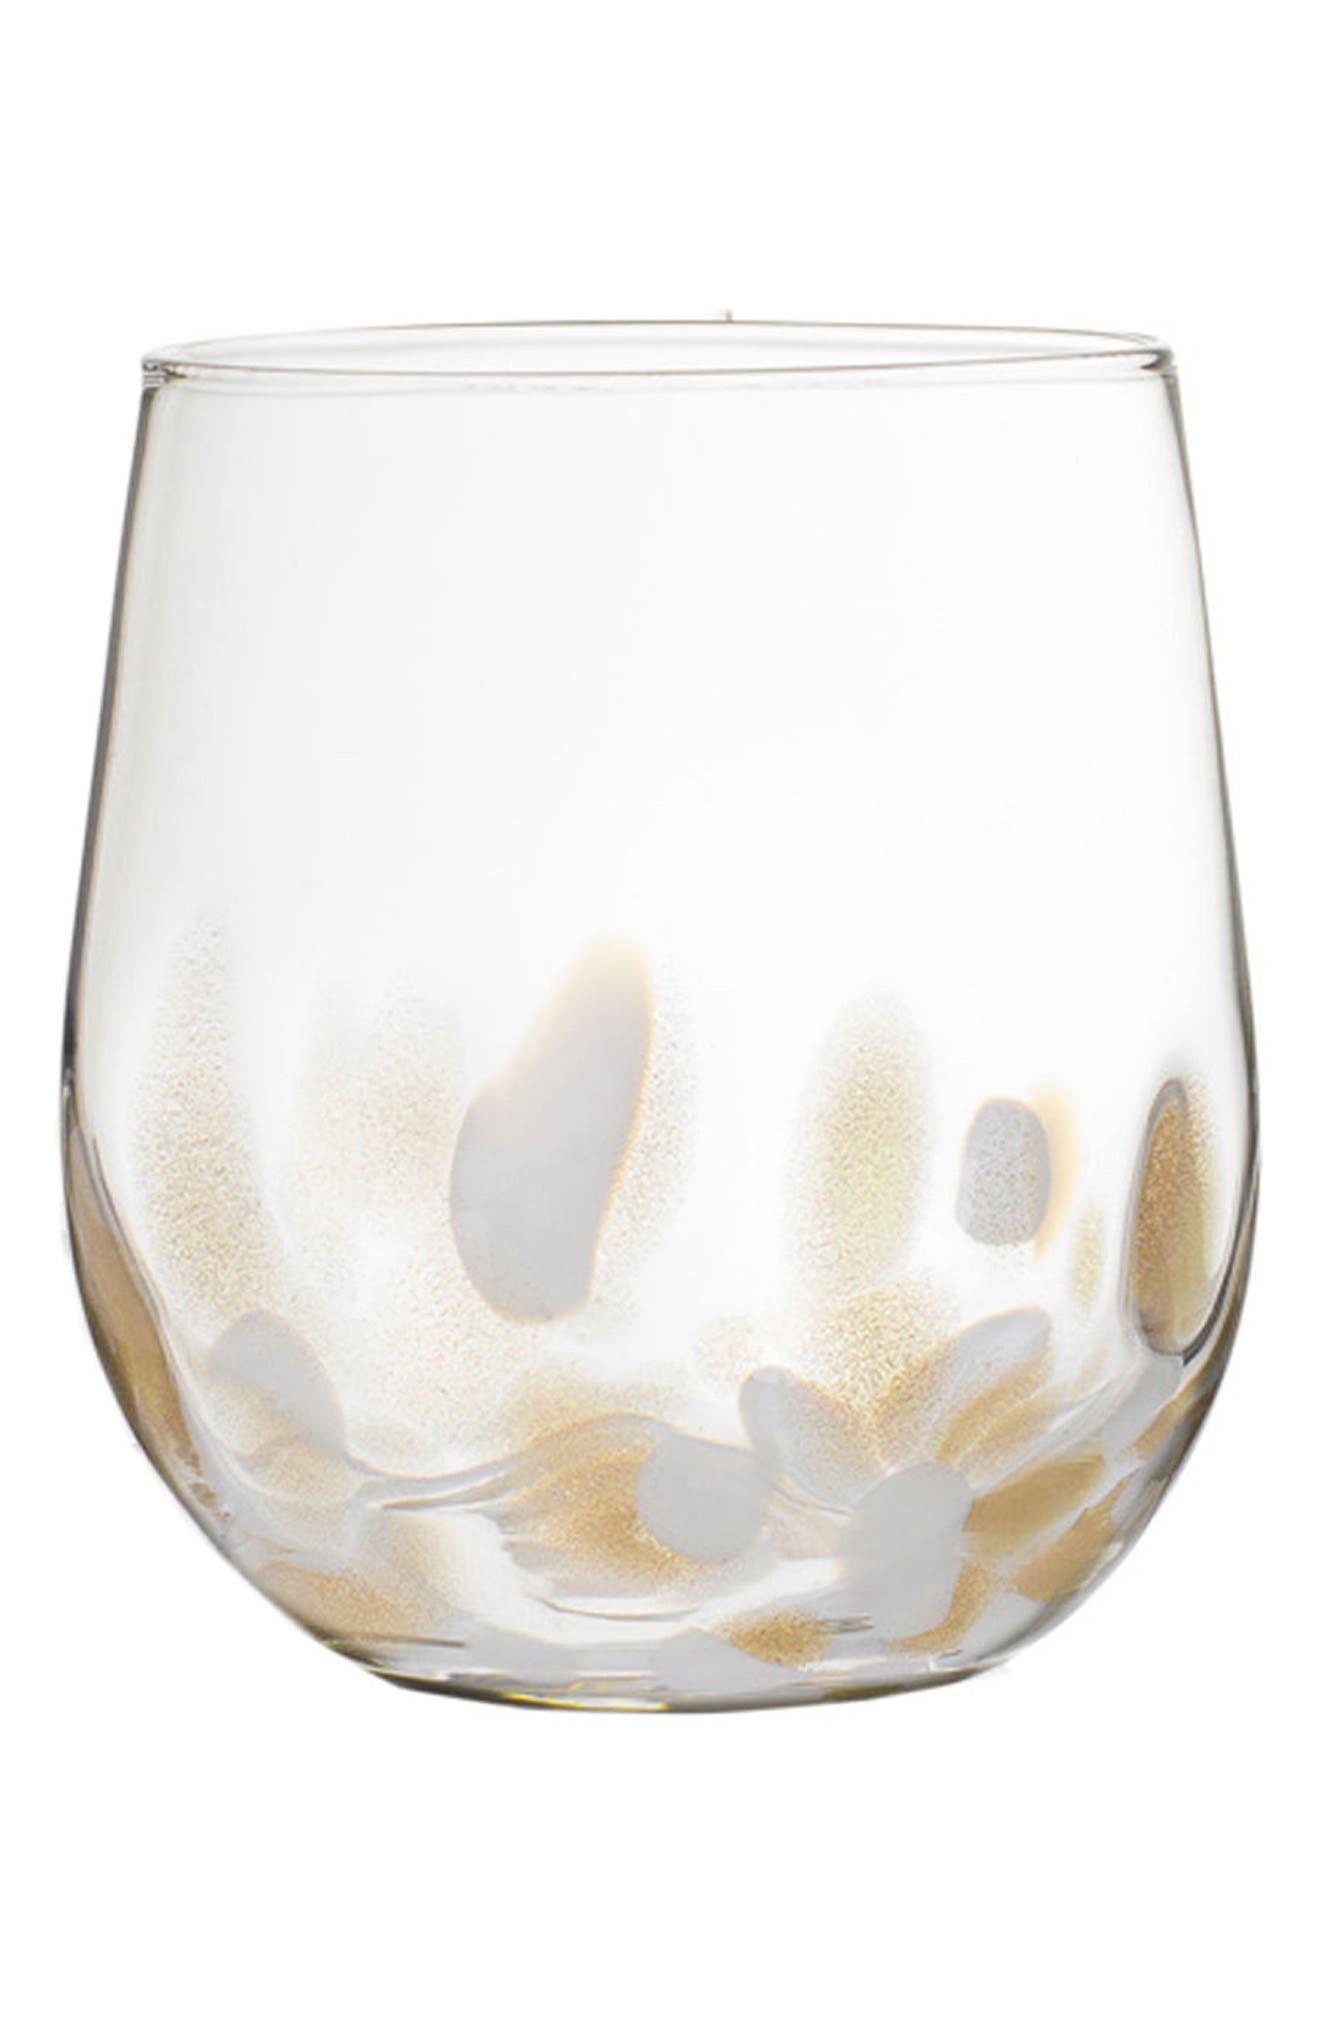 Simone Set of 4 Stemless Wine Glasses,                             Main thumbnail 1, color,                             White/ Gold